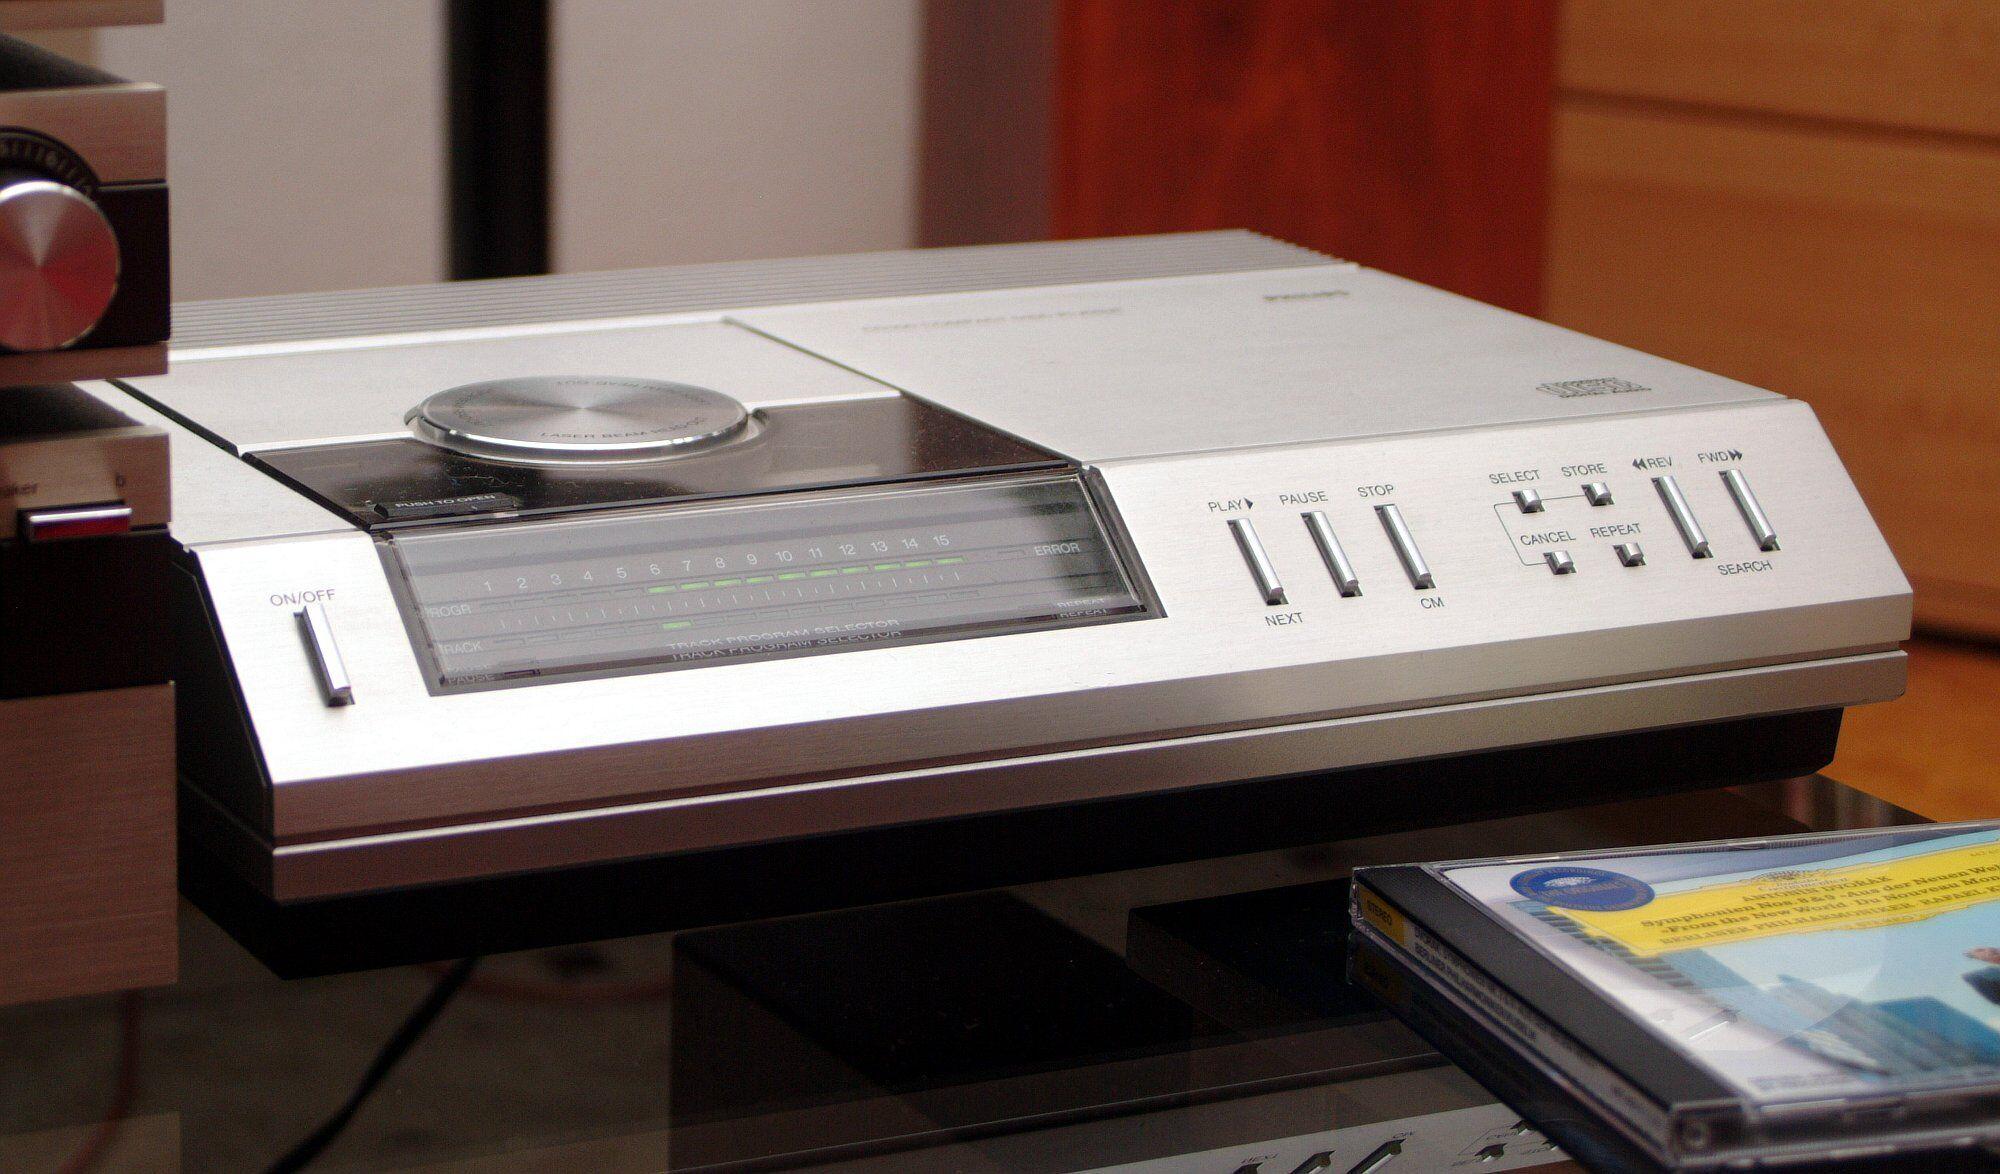 CD-плеер Philips CD100 был выпущен в ноябре 1982 года